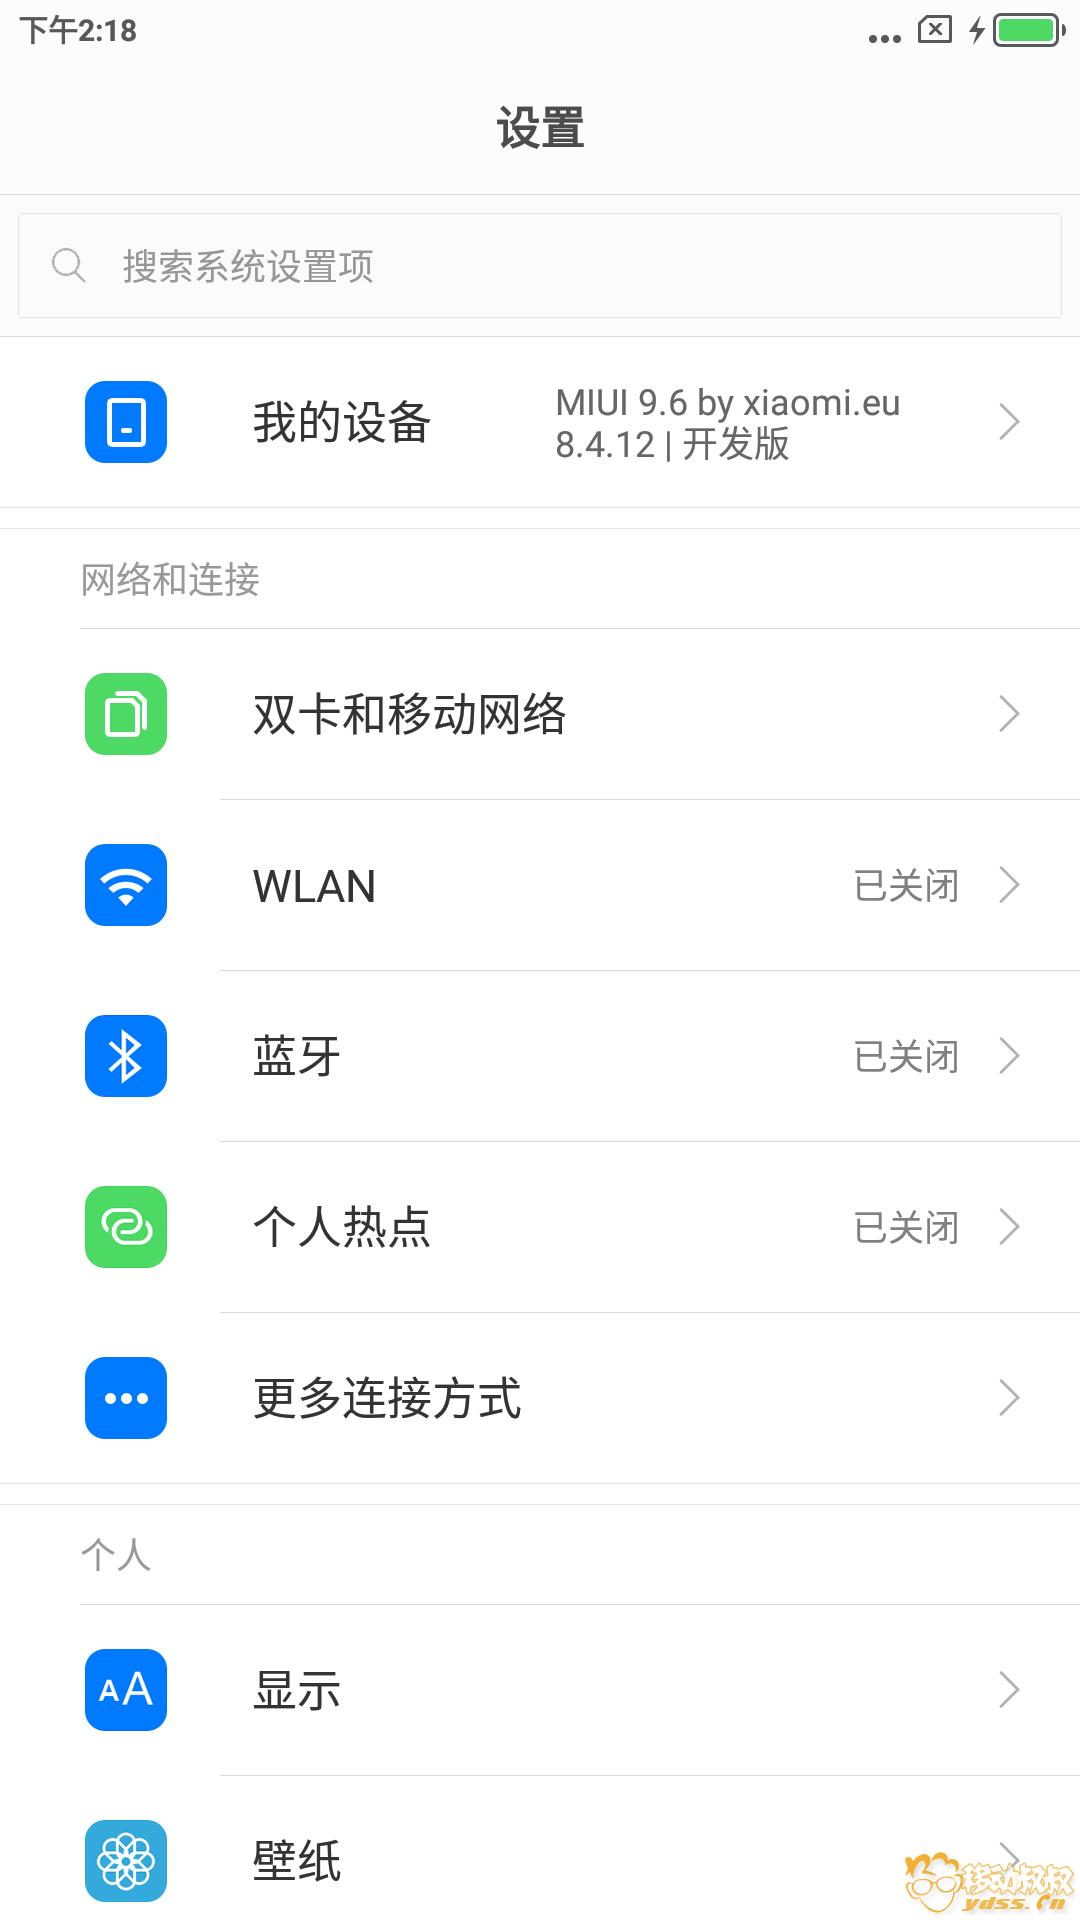 Screenshot_2018-04-22-14-18-22-967_com.android.settings.png